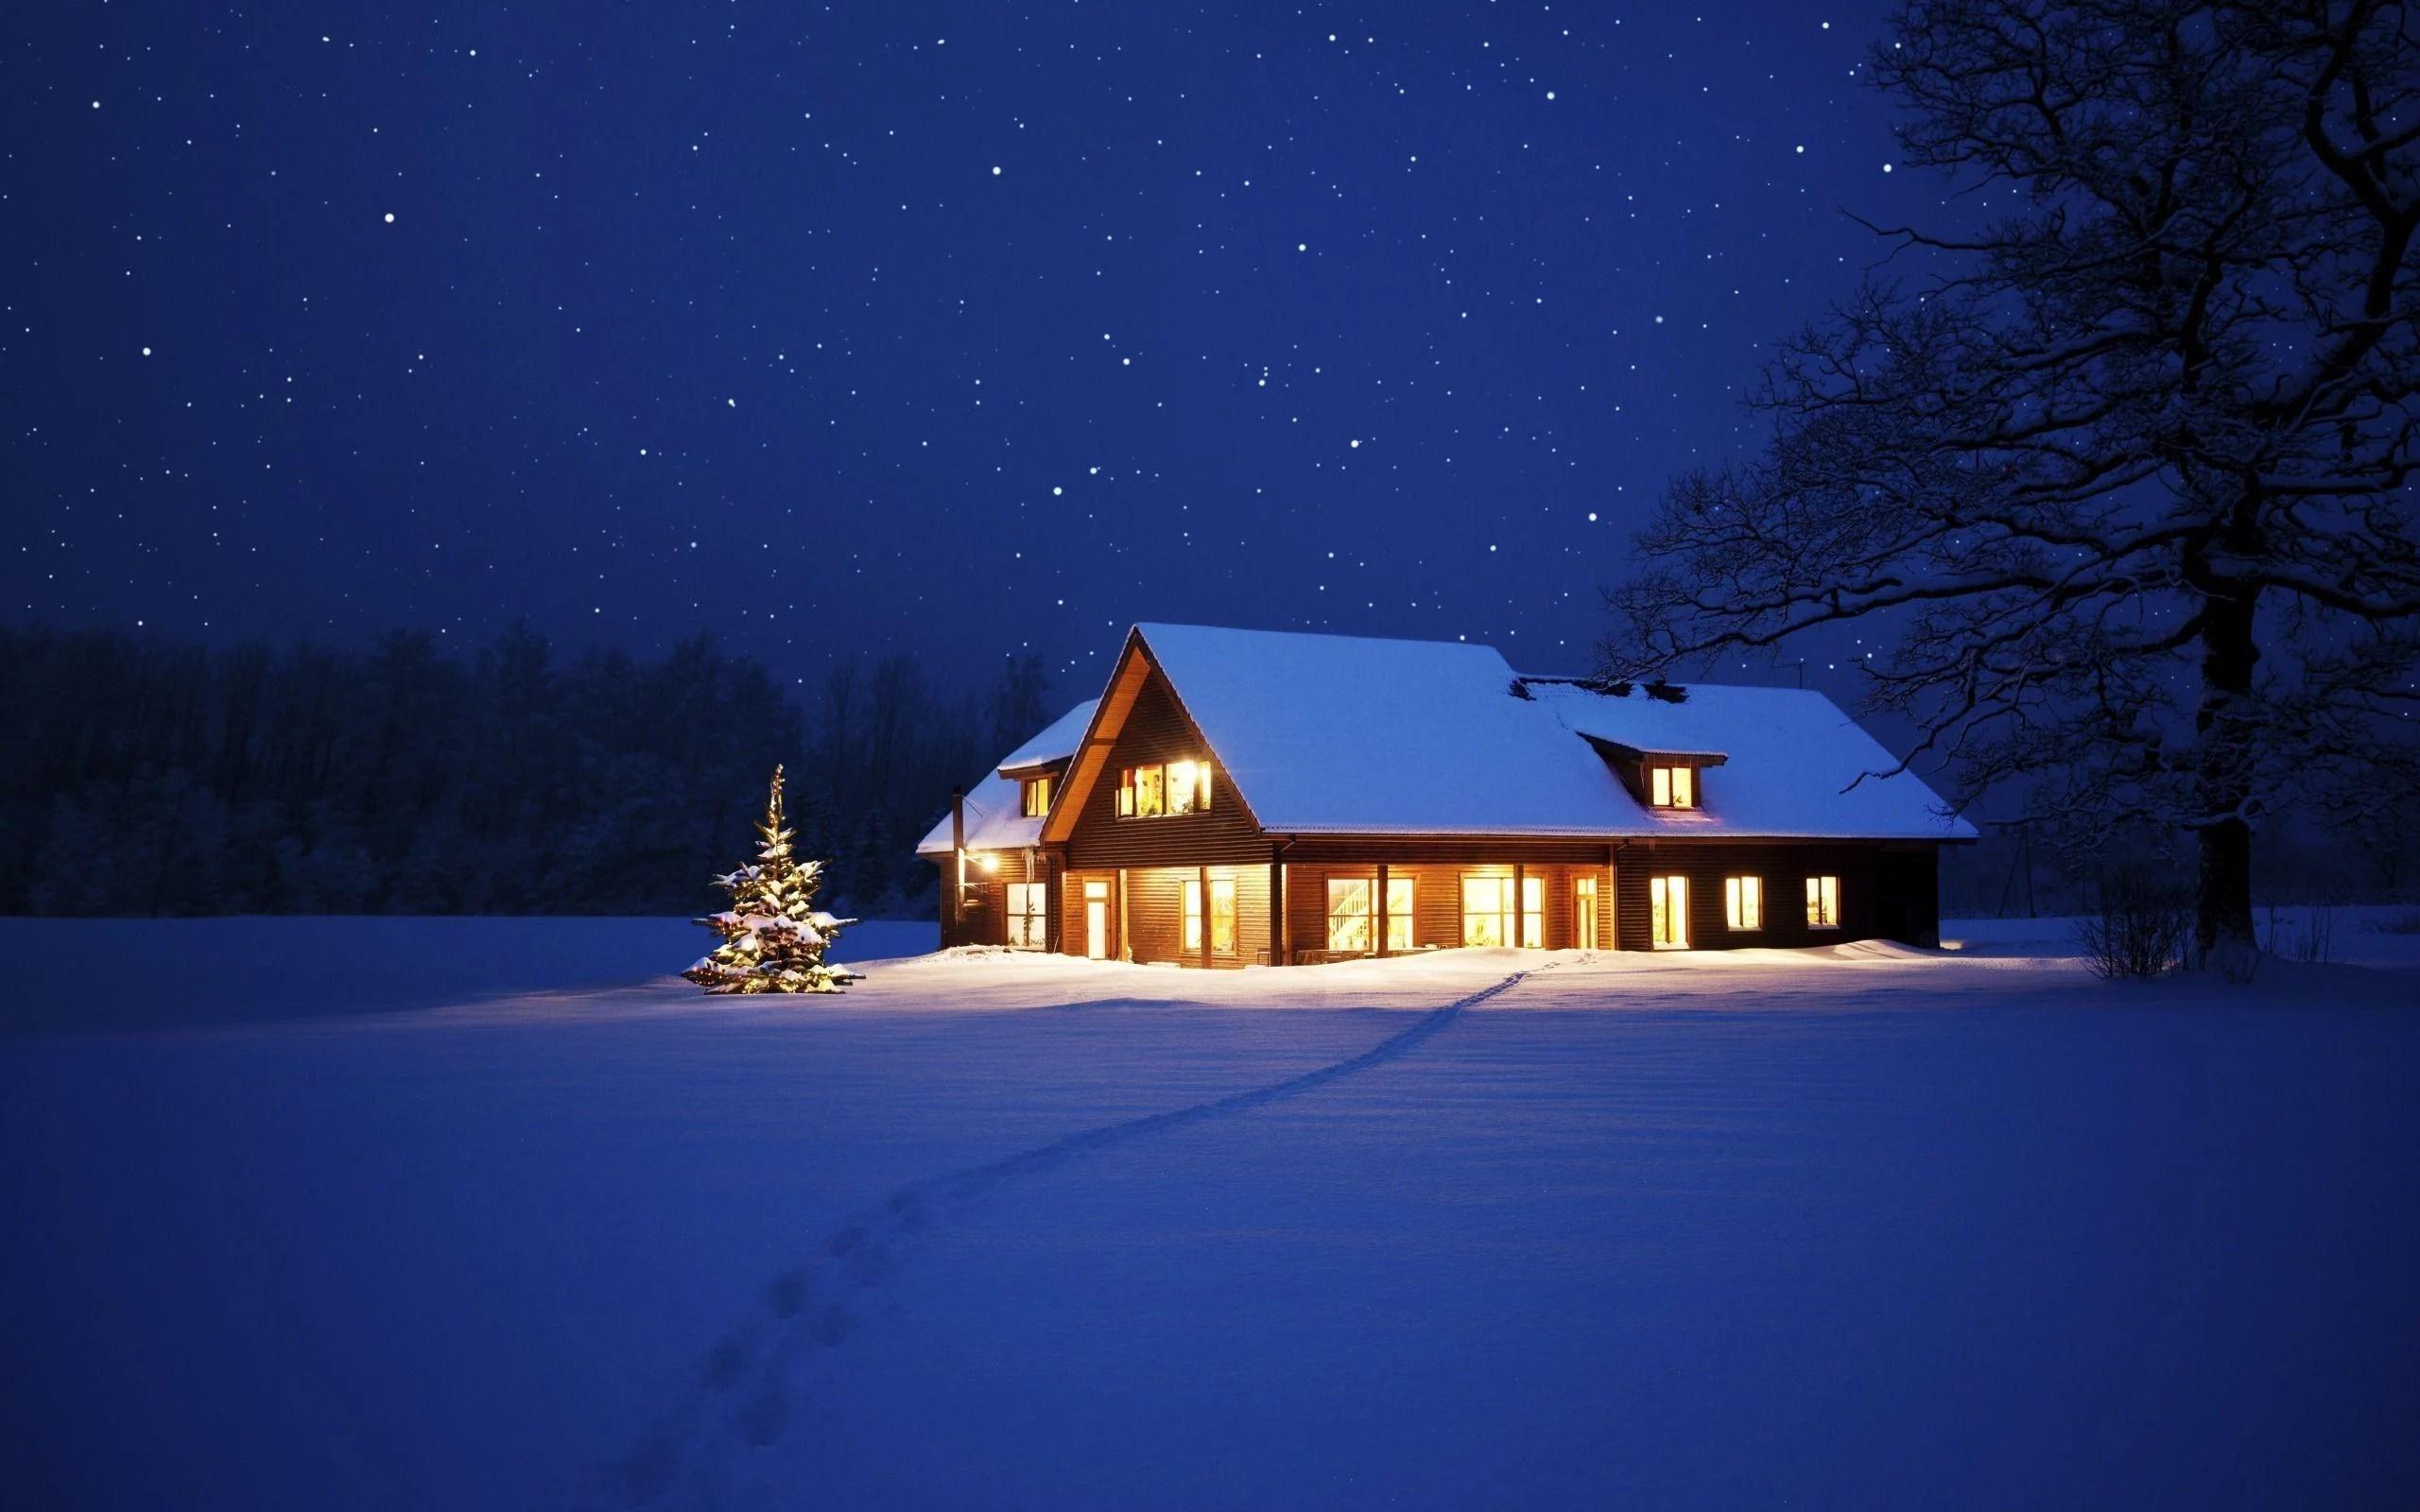 Winter Night Wallpapers